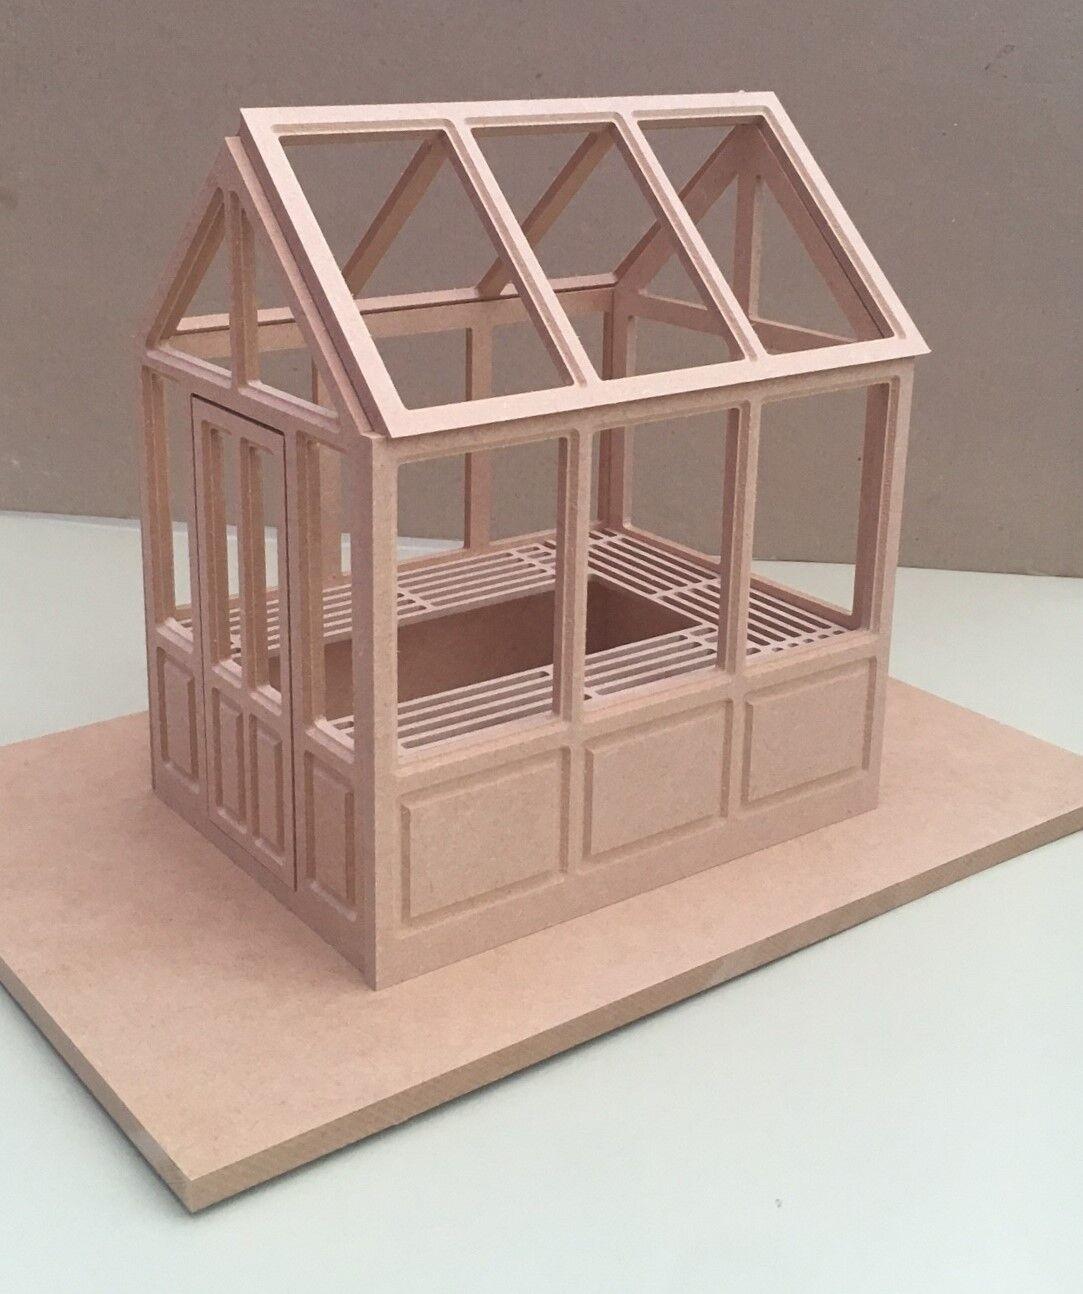 Grünhouse Kit & Staging Dolls House House House Miniature Garden  With Pre Cut Acetate 61b57c